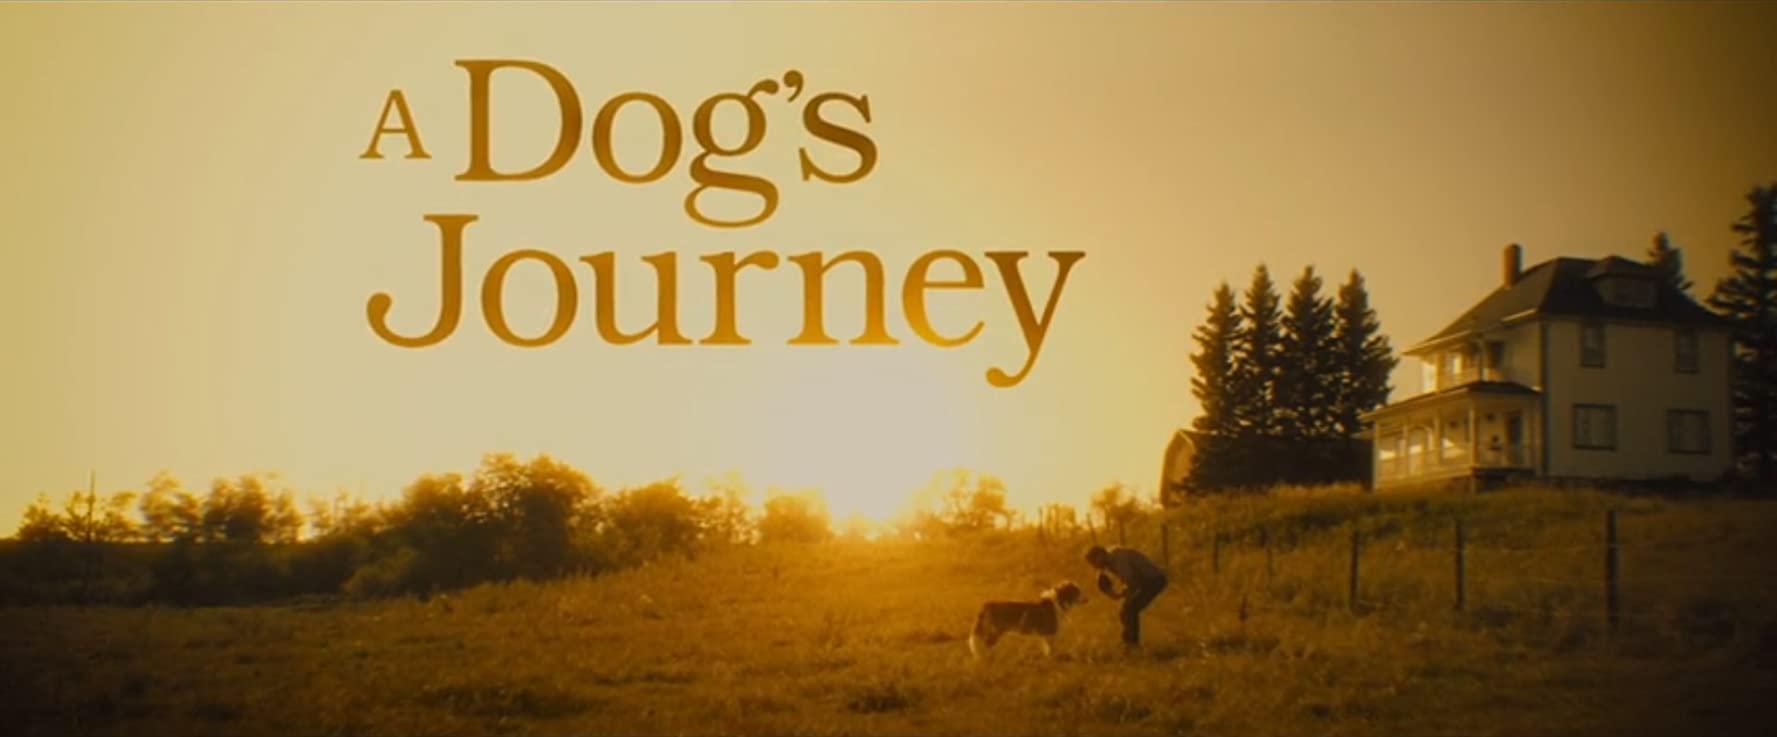 مشاهدة فيلم A Dog's Journey (2019) مترجم HD اون لاين